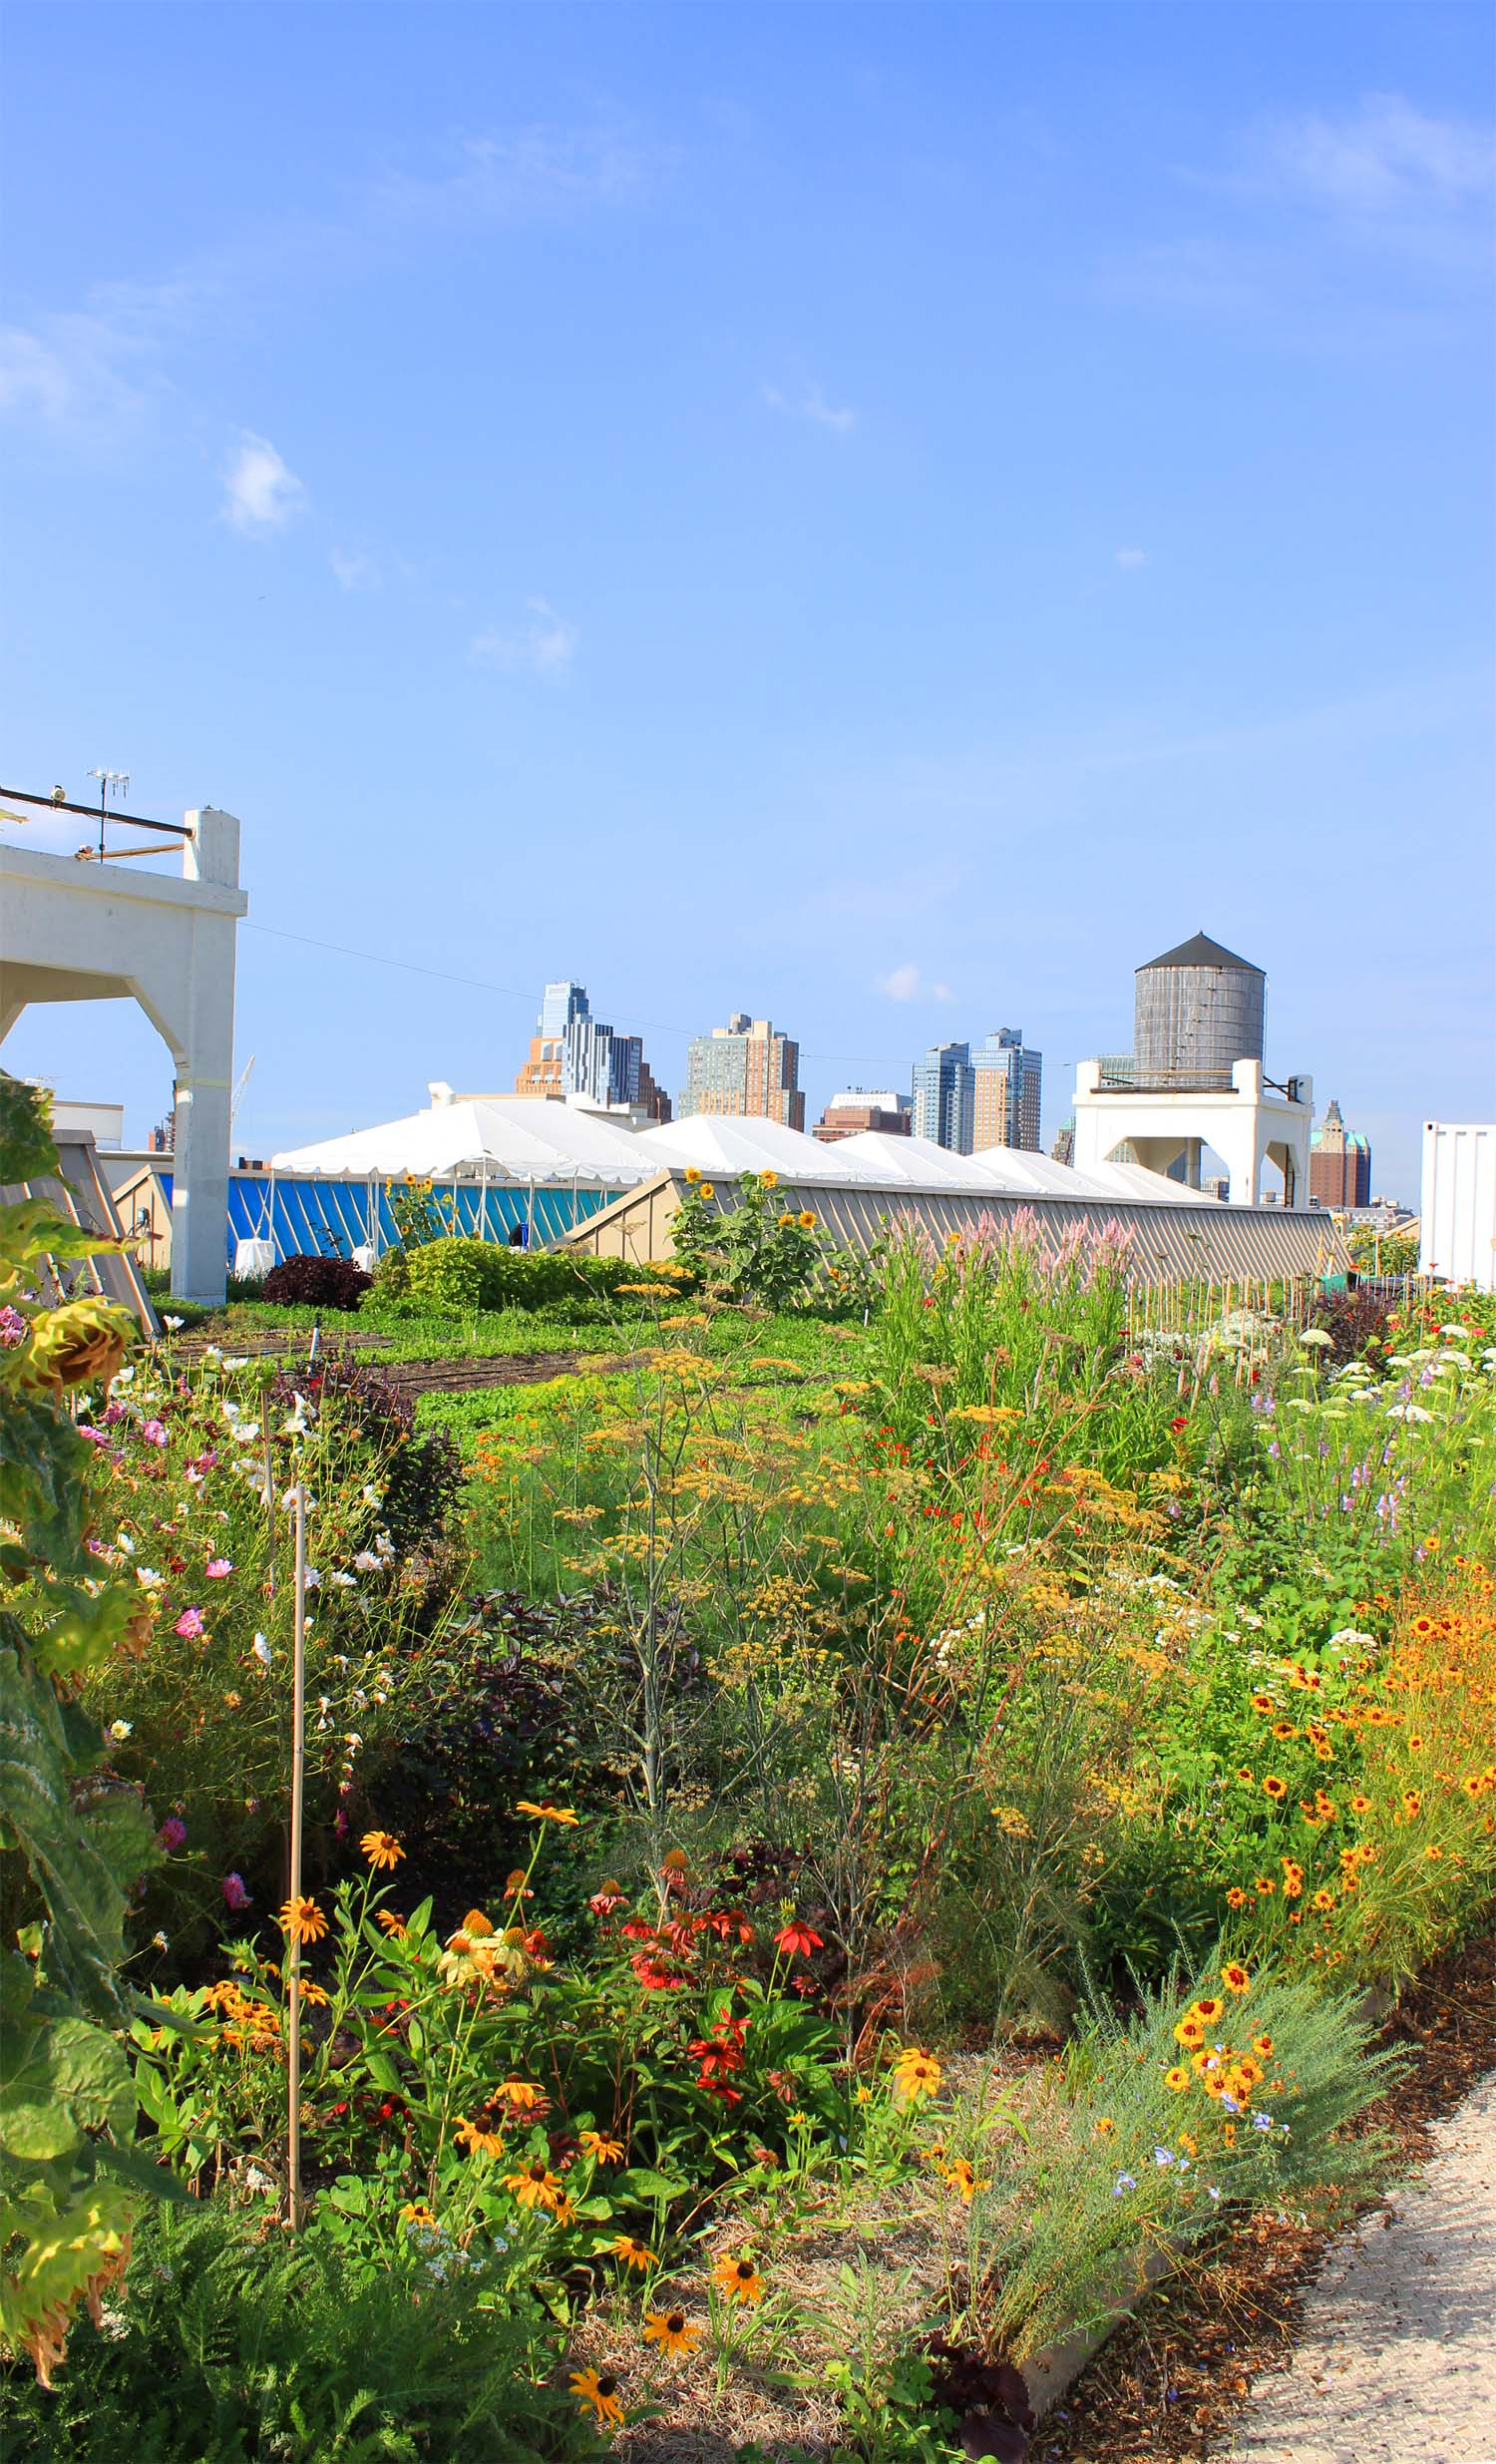 Brooklyn Grange Farm, Brooklyn Navy Yard  | Image:  Laura Messersmith